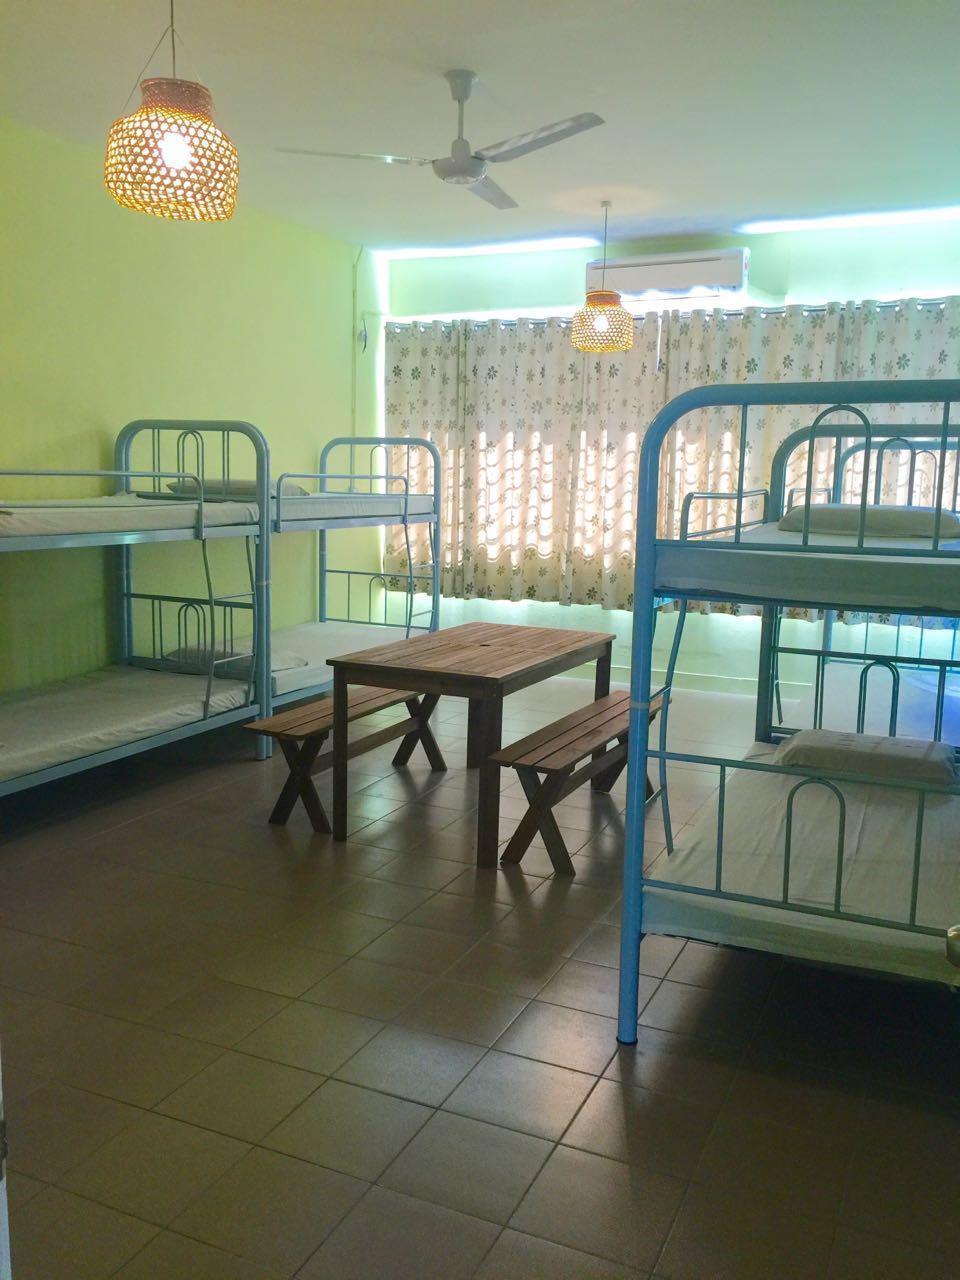 Akinabalu Youth Hostel, Kota Kinabalu